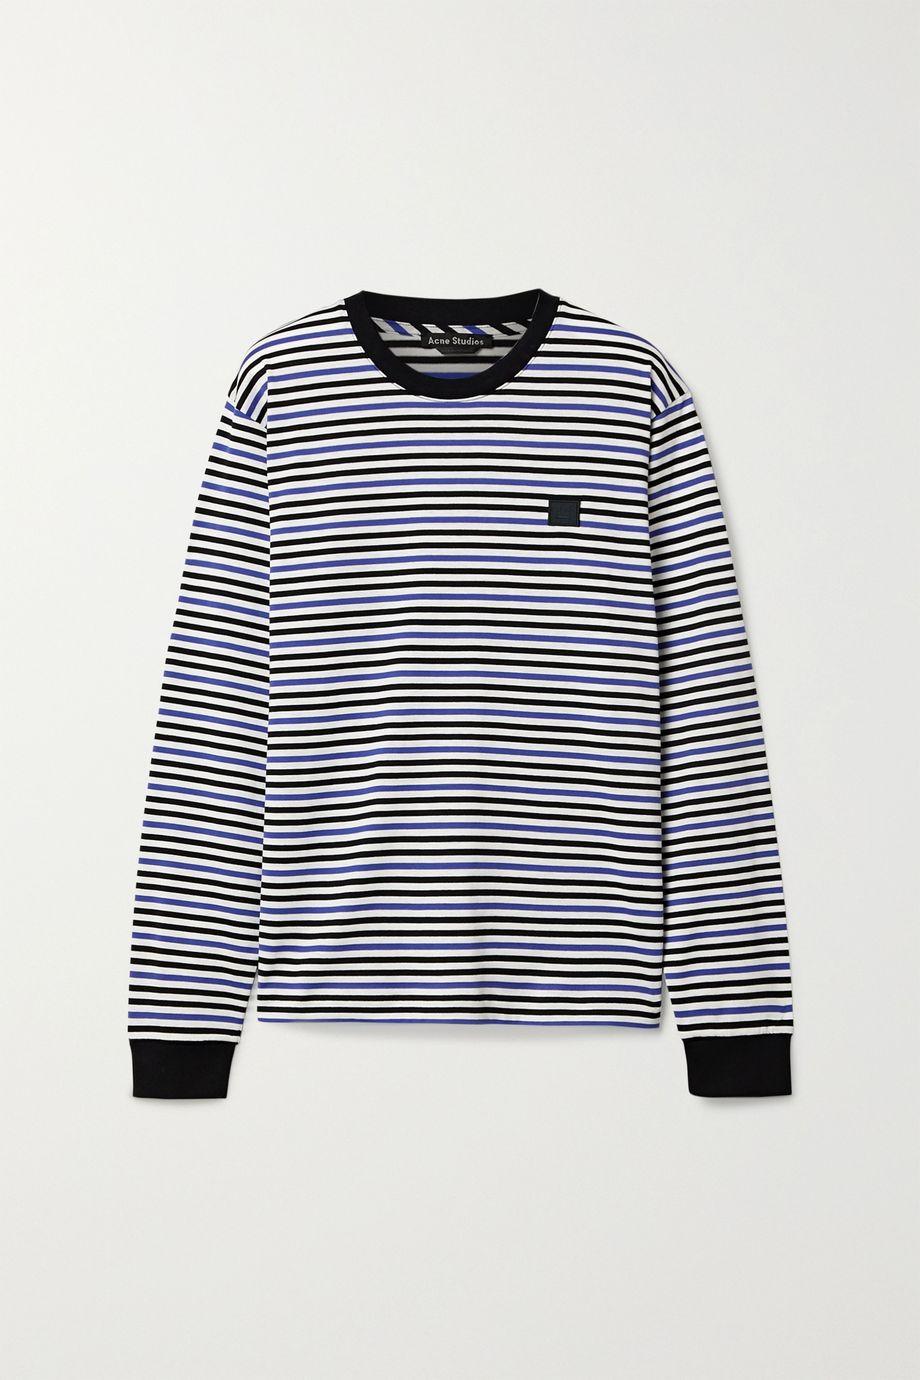 Acne Studios Appliquéd striped cotton-jersey top